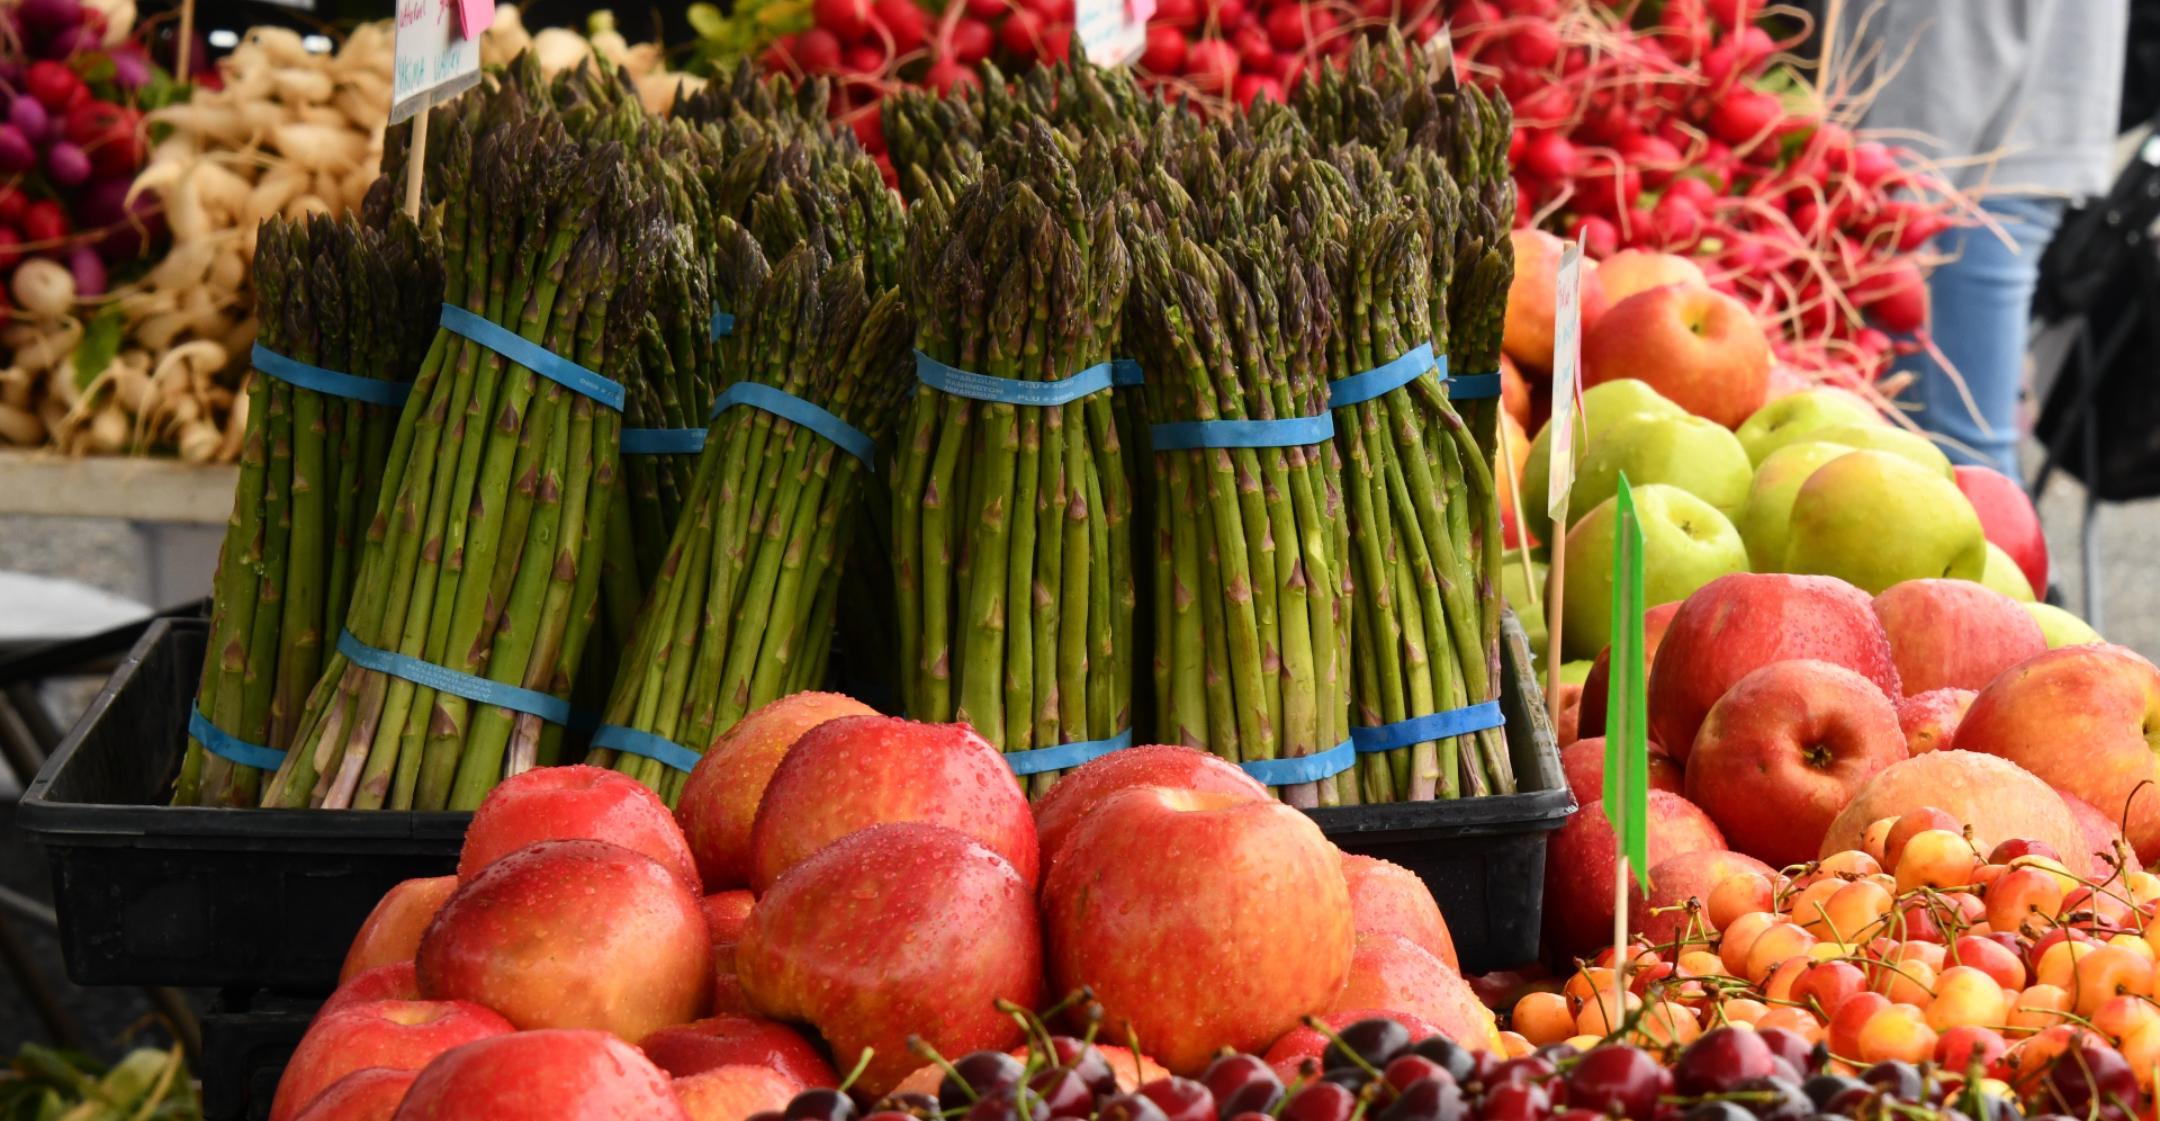 servings fruit veggies add years to life